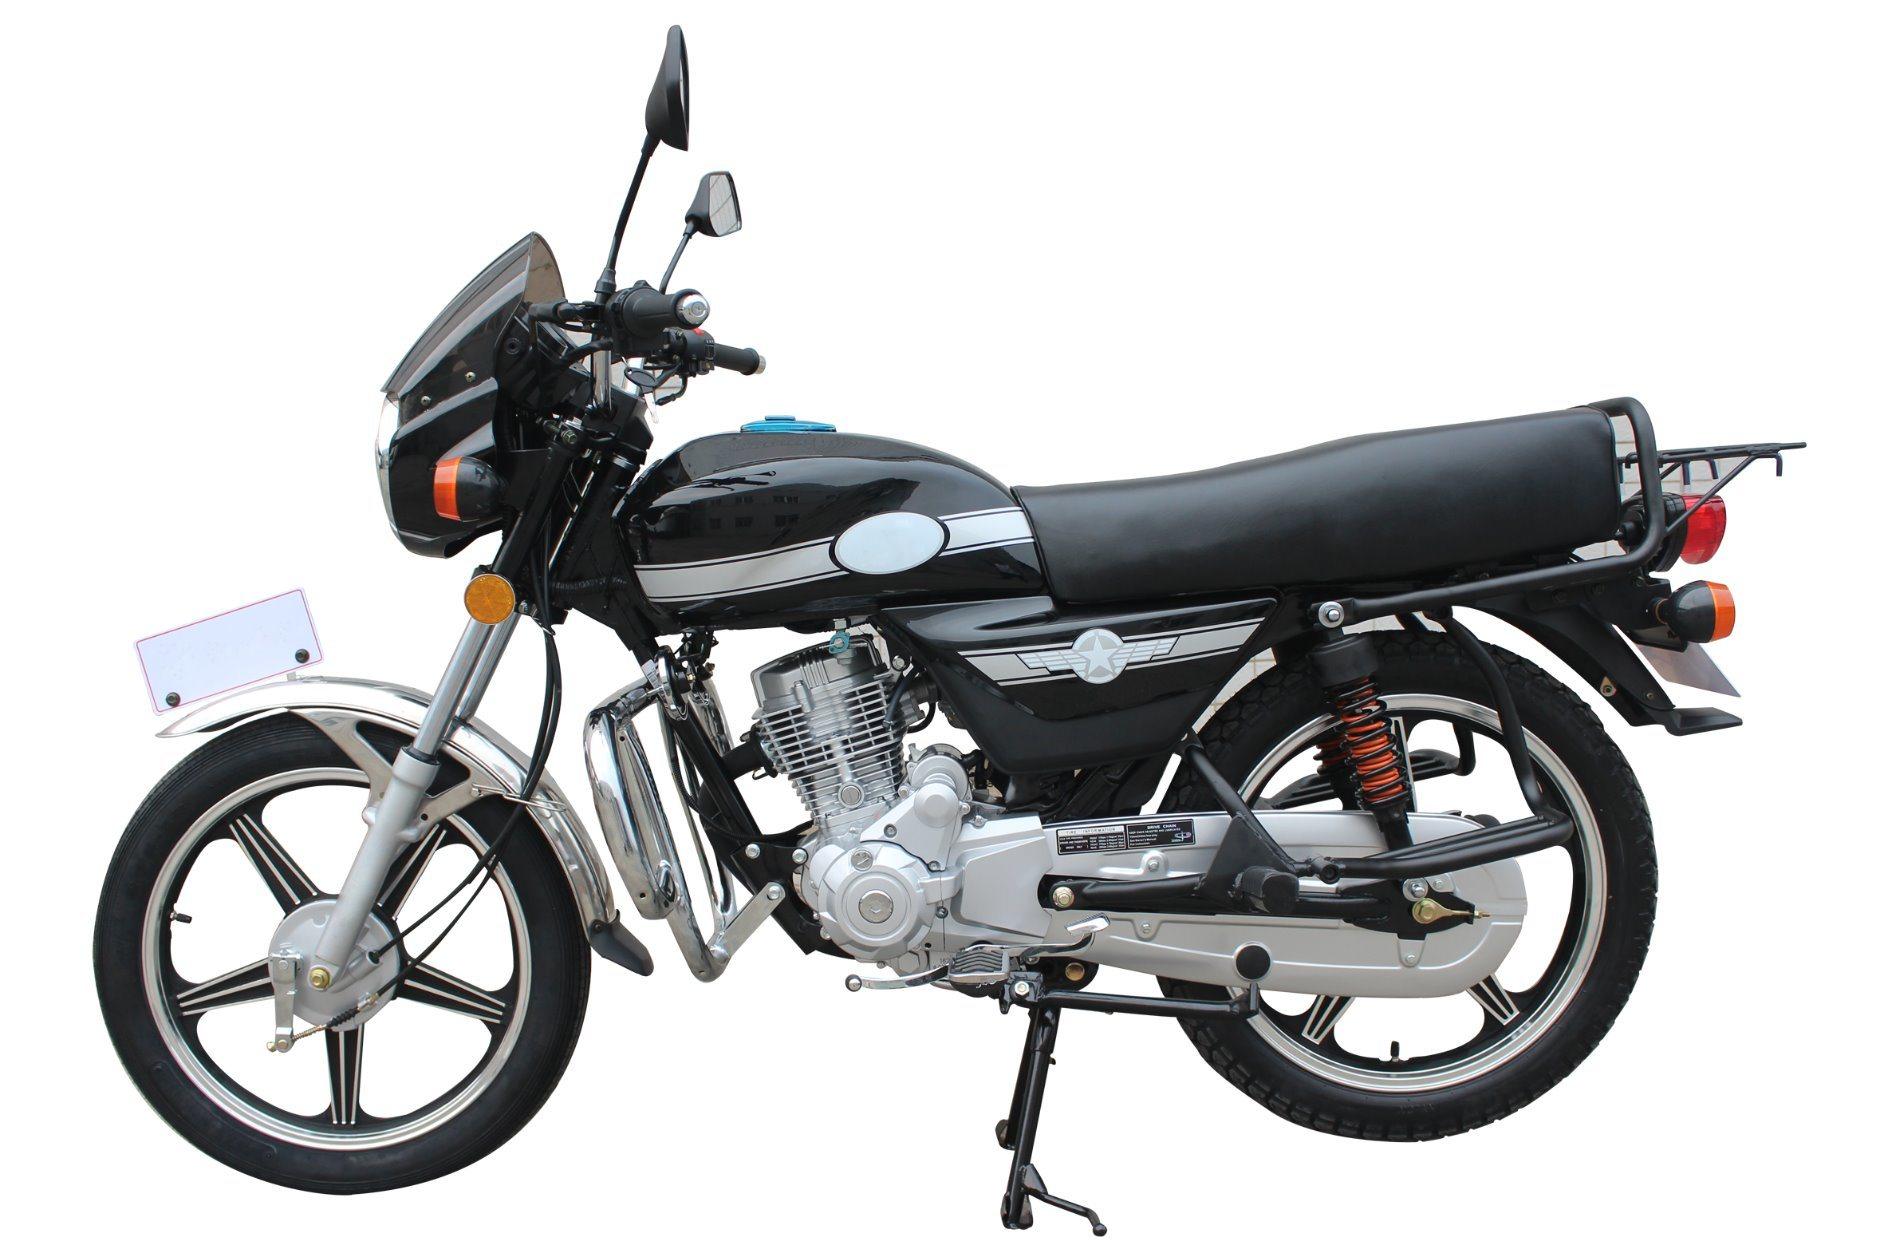 150cc Standard Motorcycle, Most Popular Motor, Three Passengers